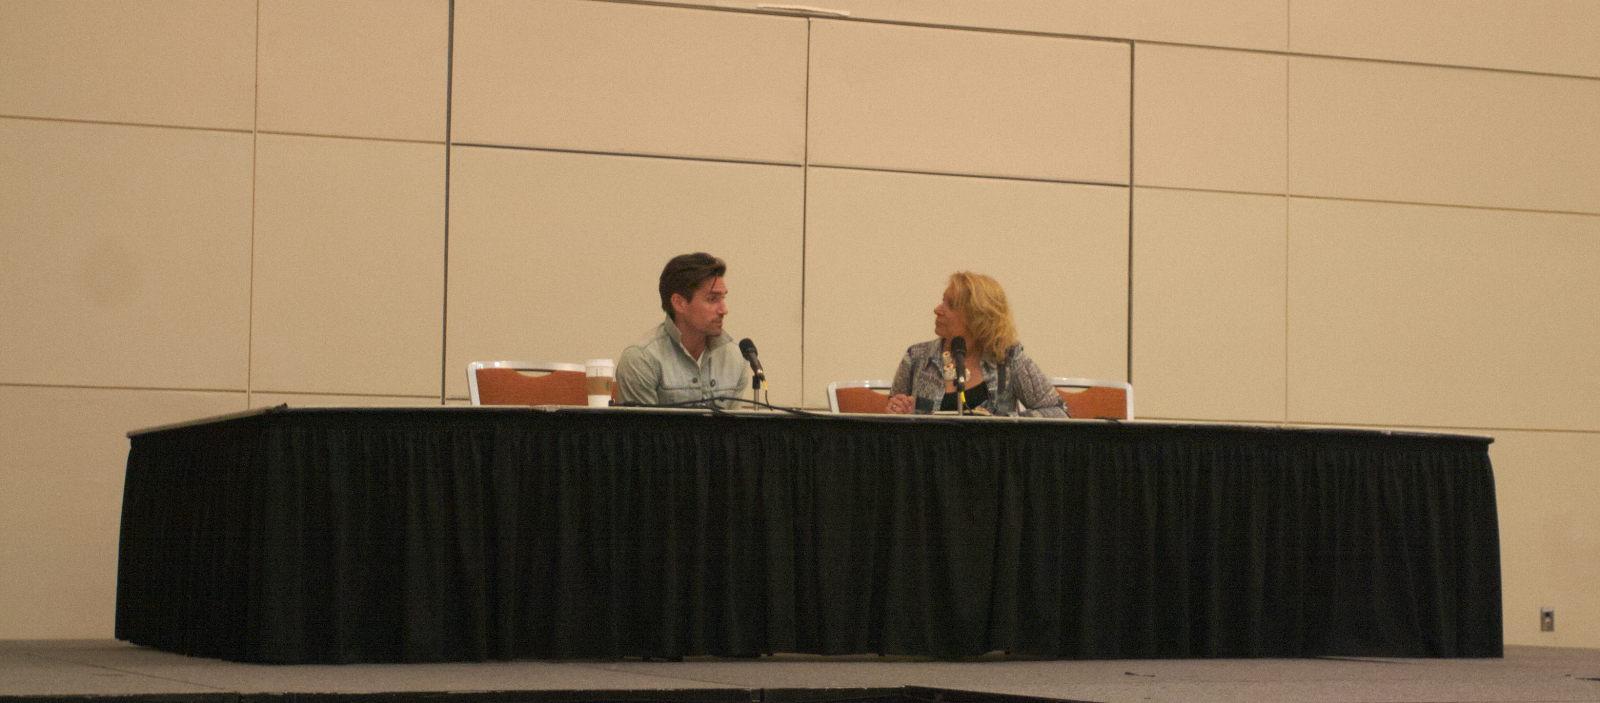 Michael Rowe Spotlight at Baltimore Comic-Con 2016